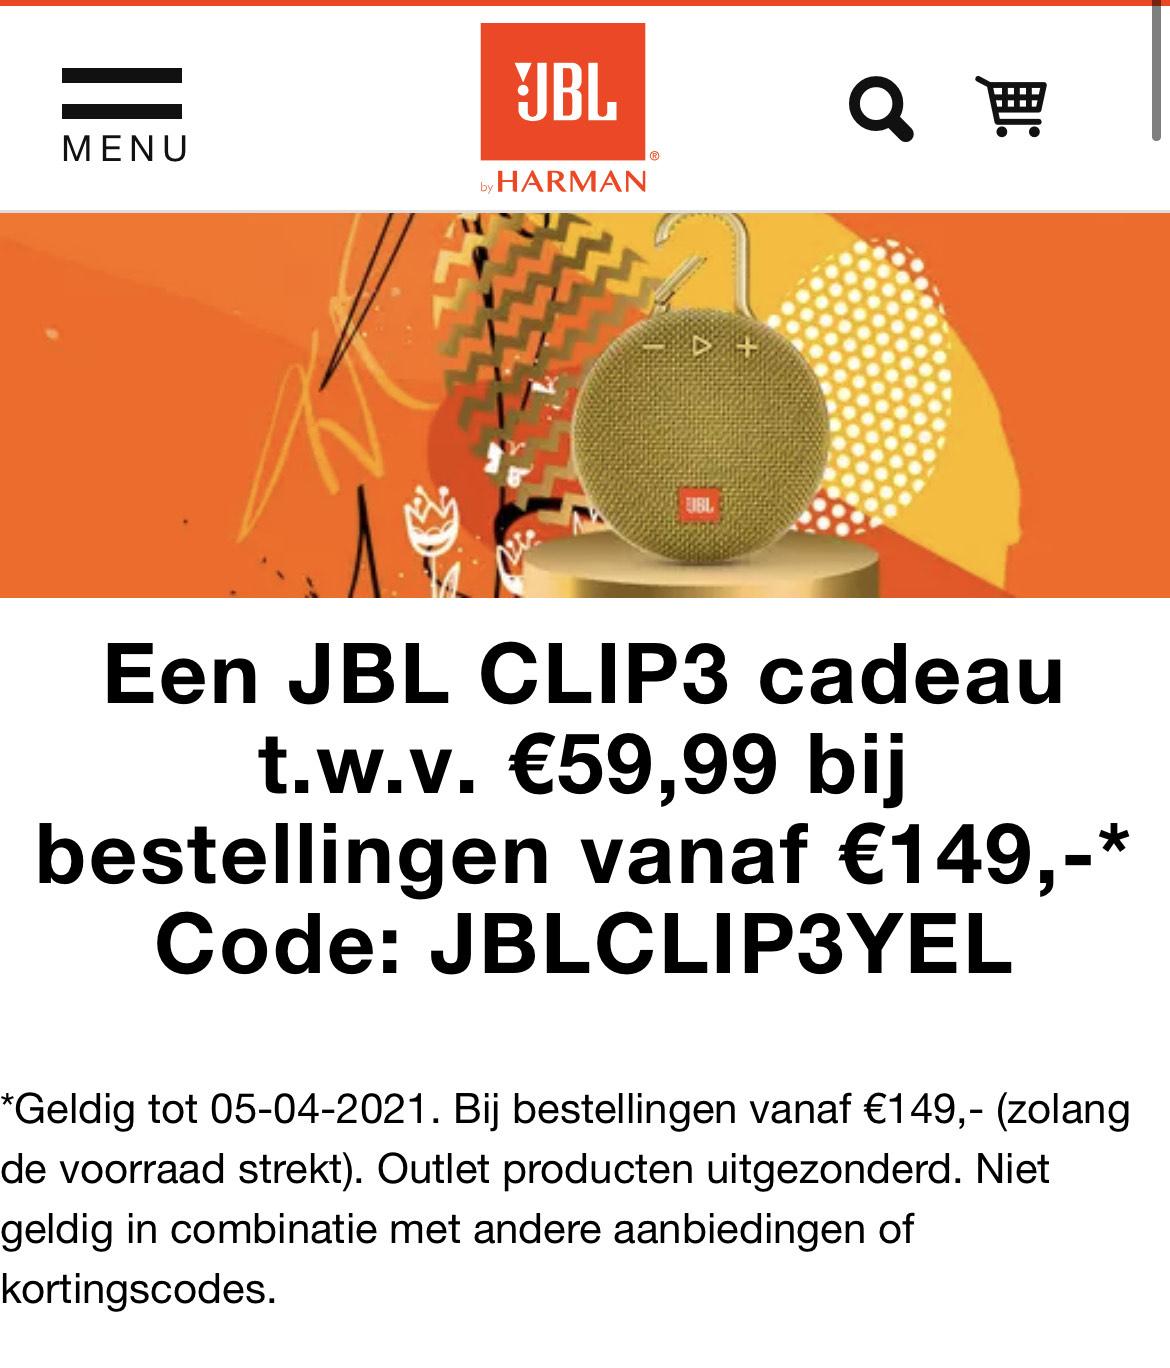 Gratis JBL Clip3 t.w.v. € 59,95 bij bestellingen vanaf €149 @ JBL